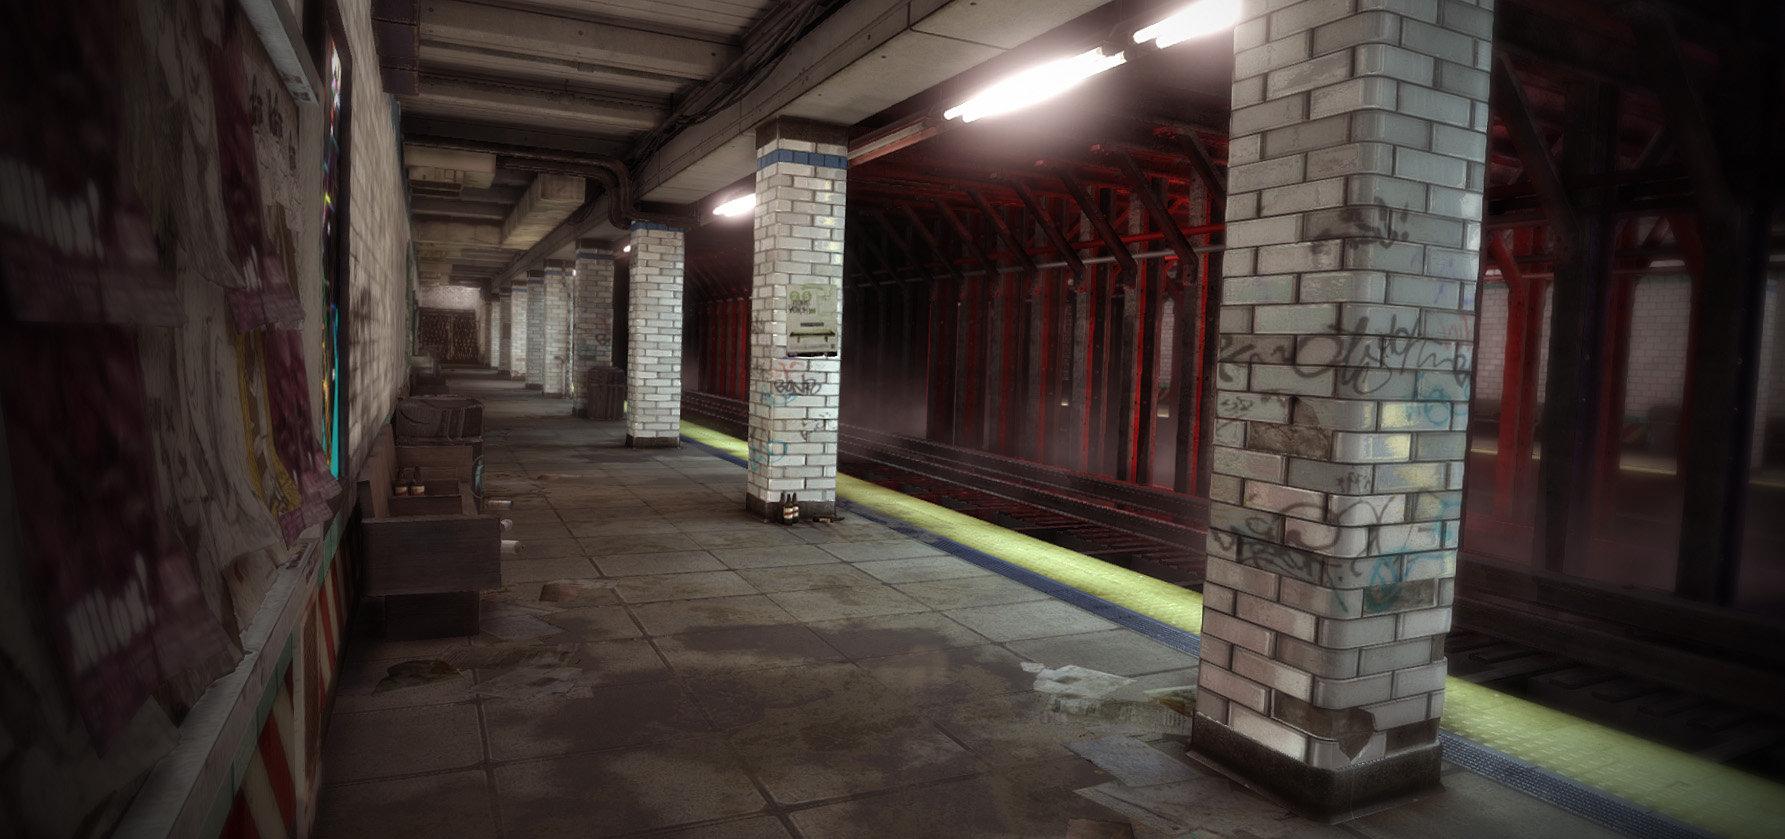 Jeff severson subway 01